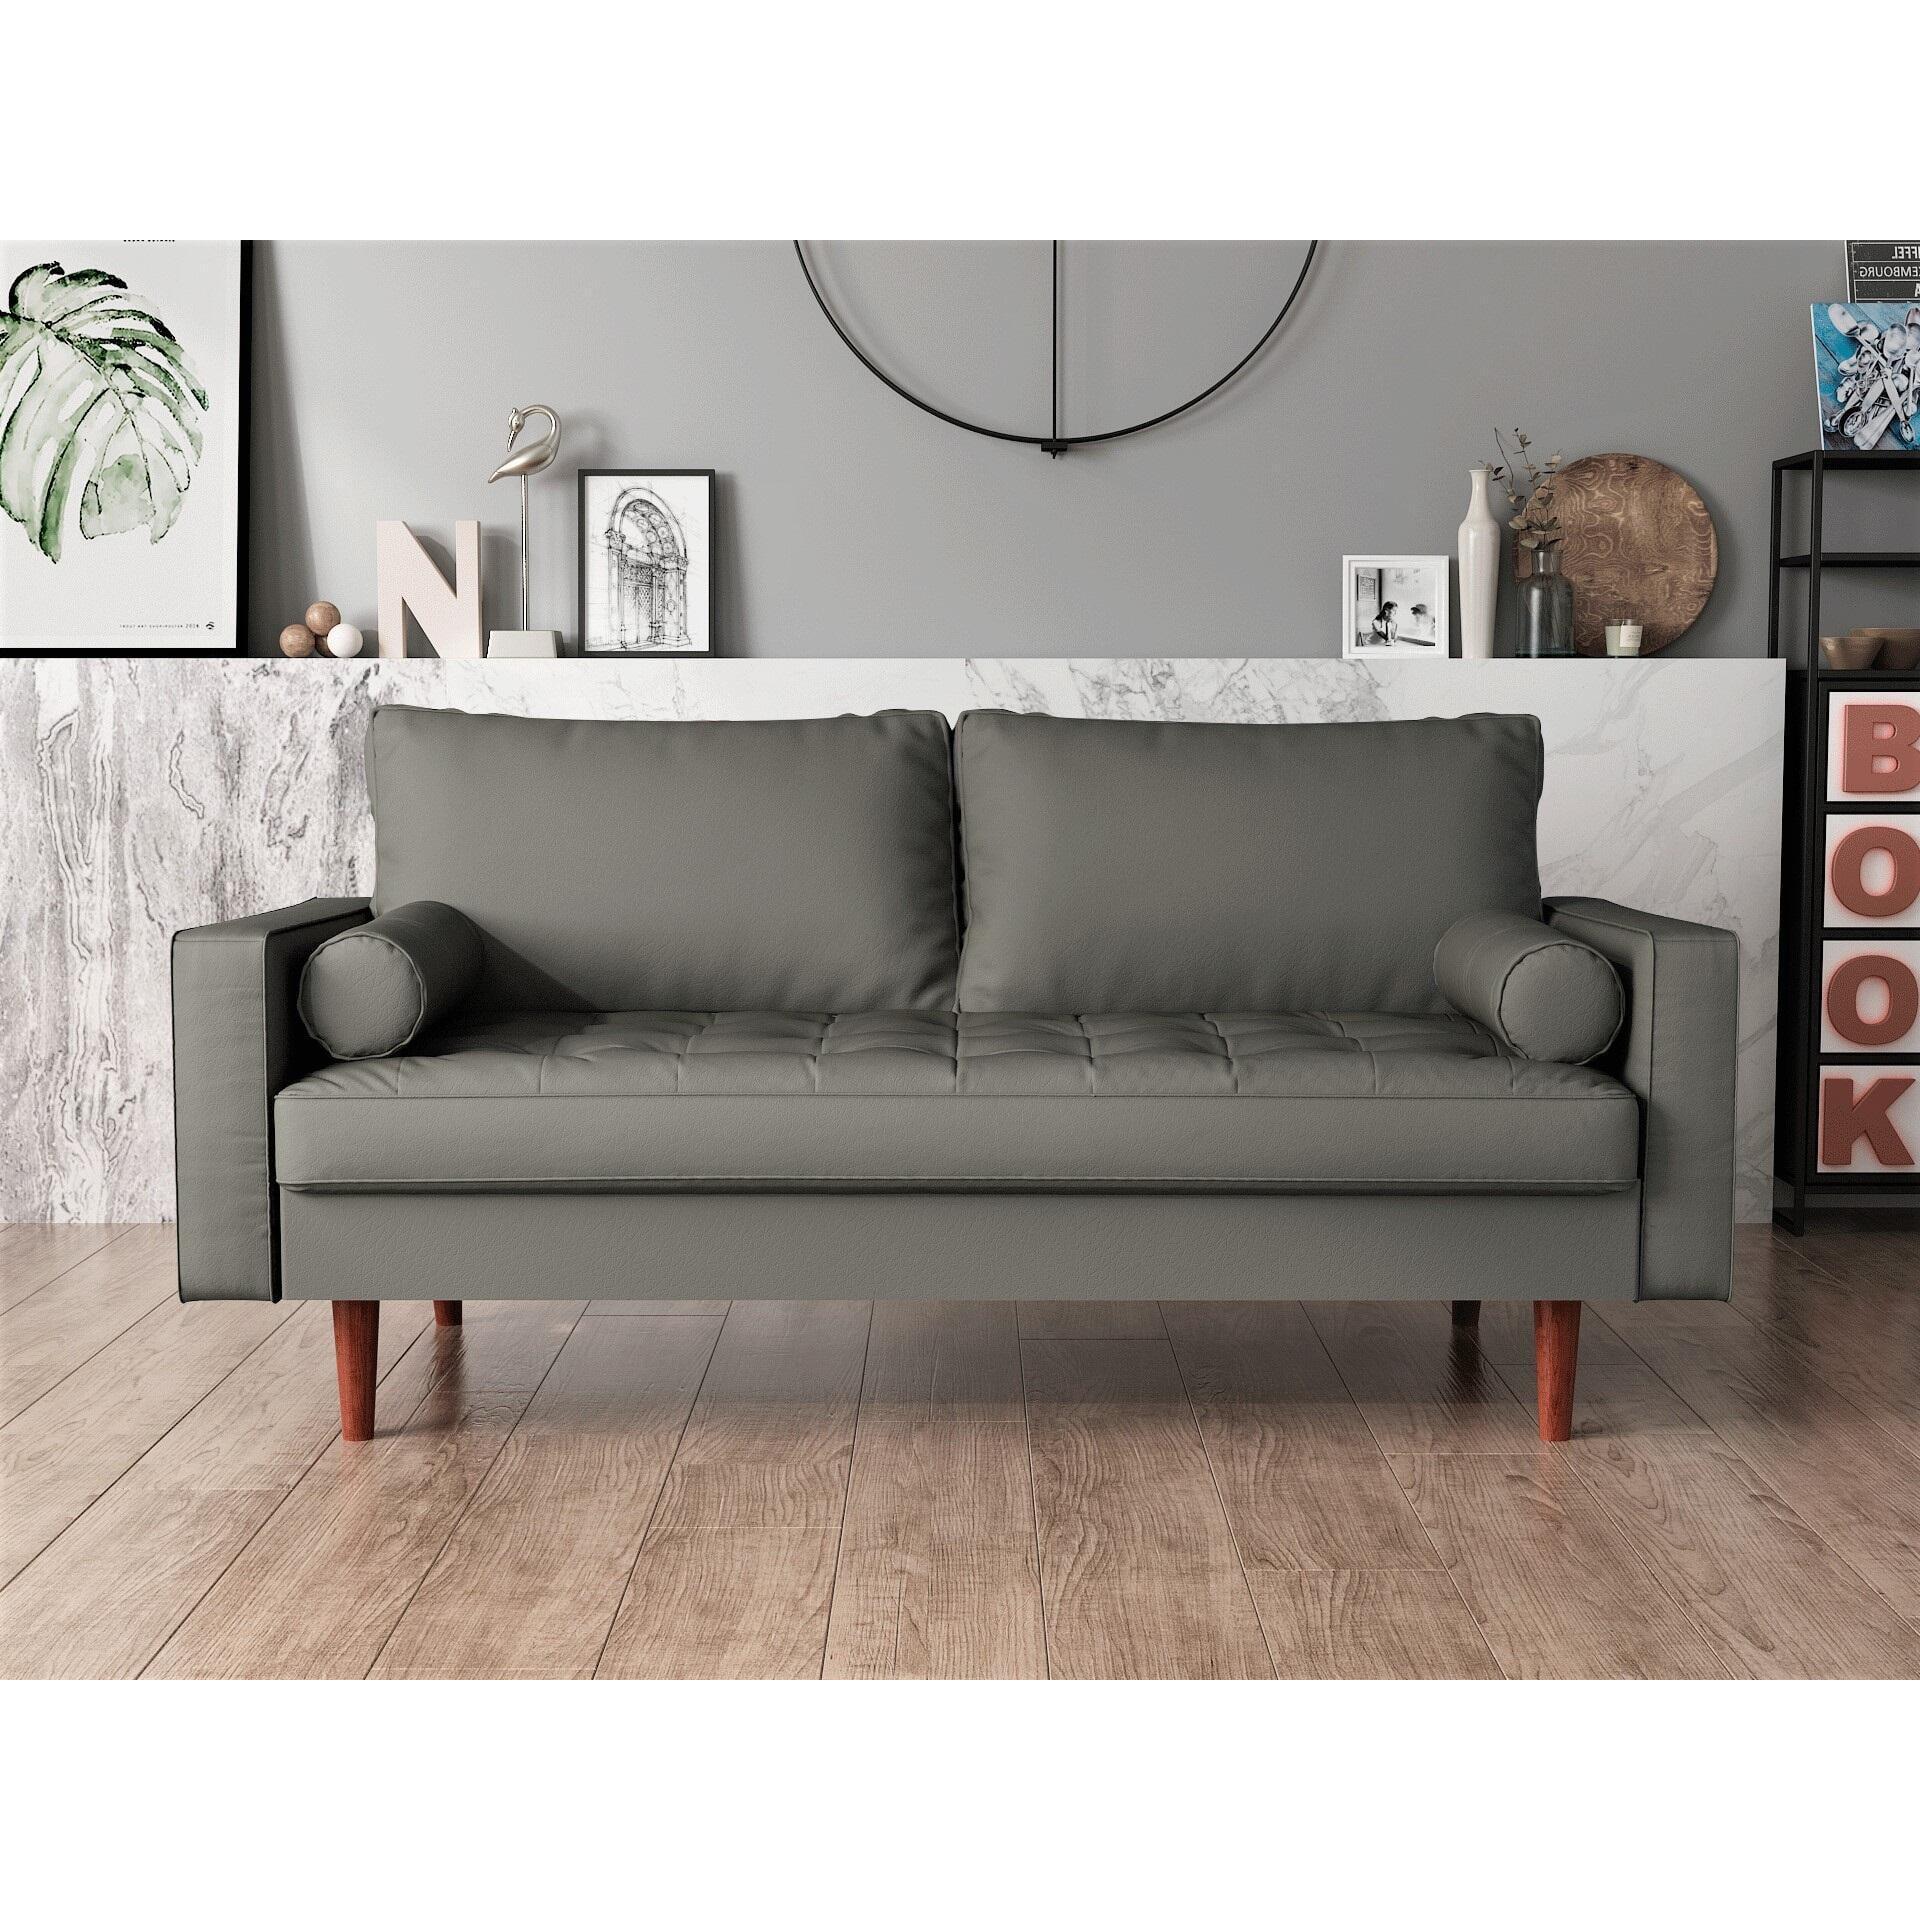 Us Pride Furniture Mid Century Gabler Loveseat In Faux Leather Gray Walmart Com Walmart Com